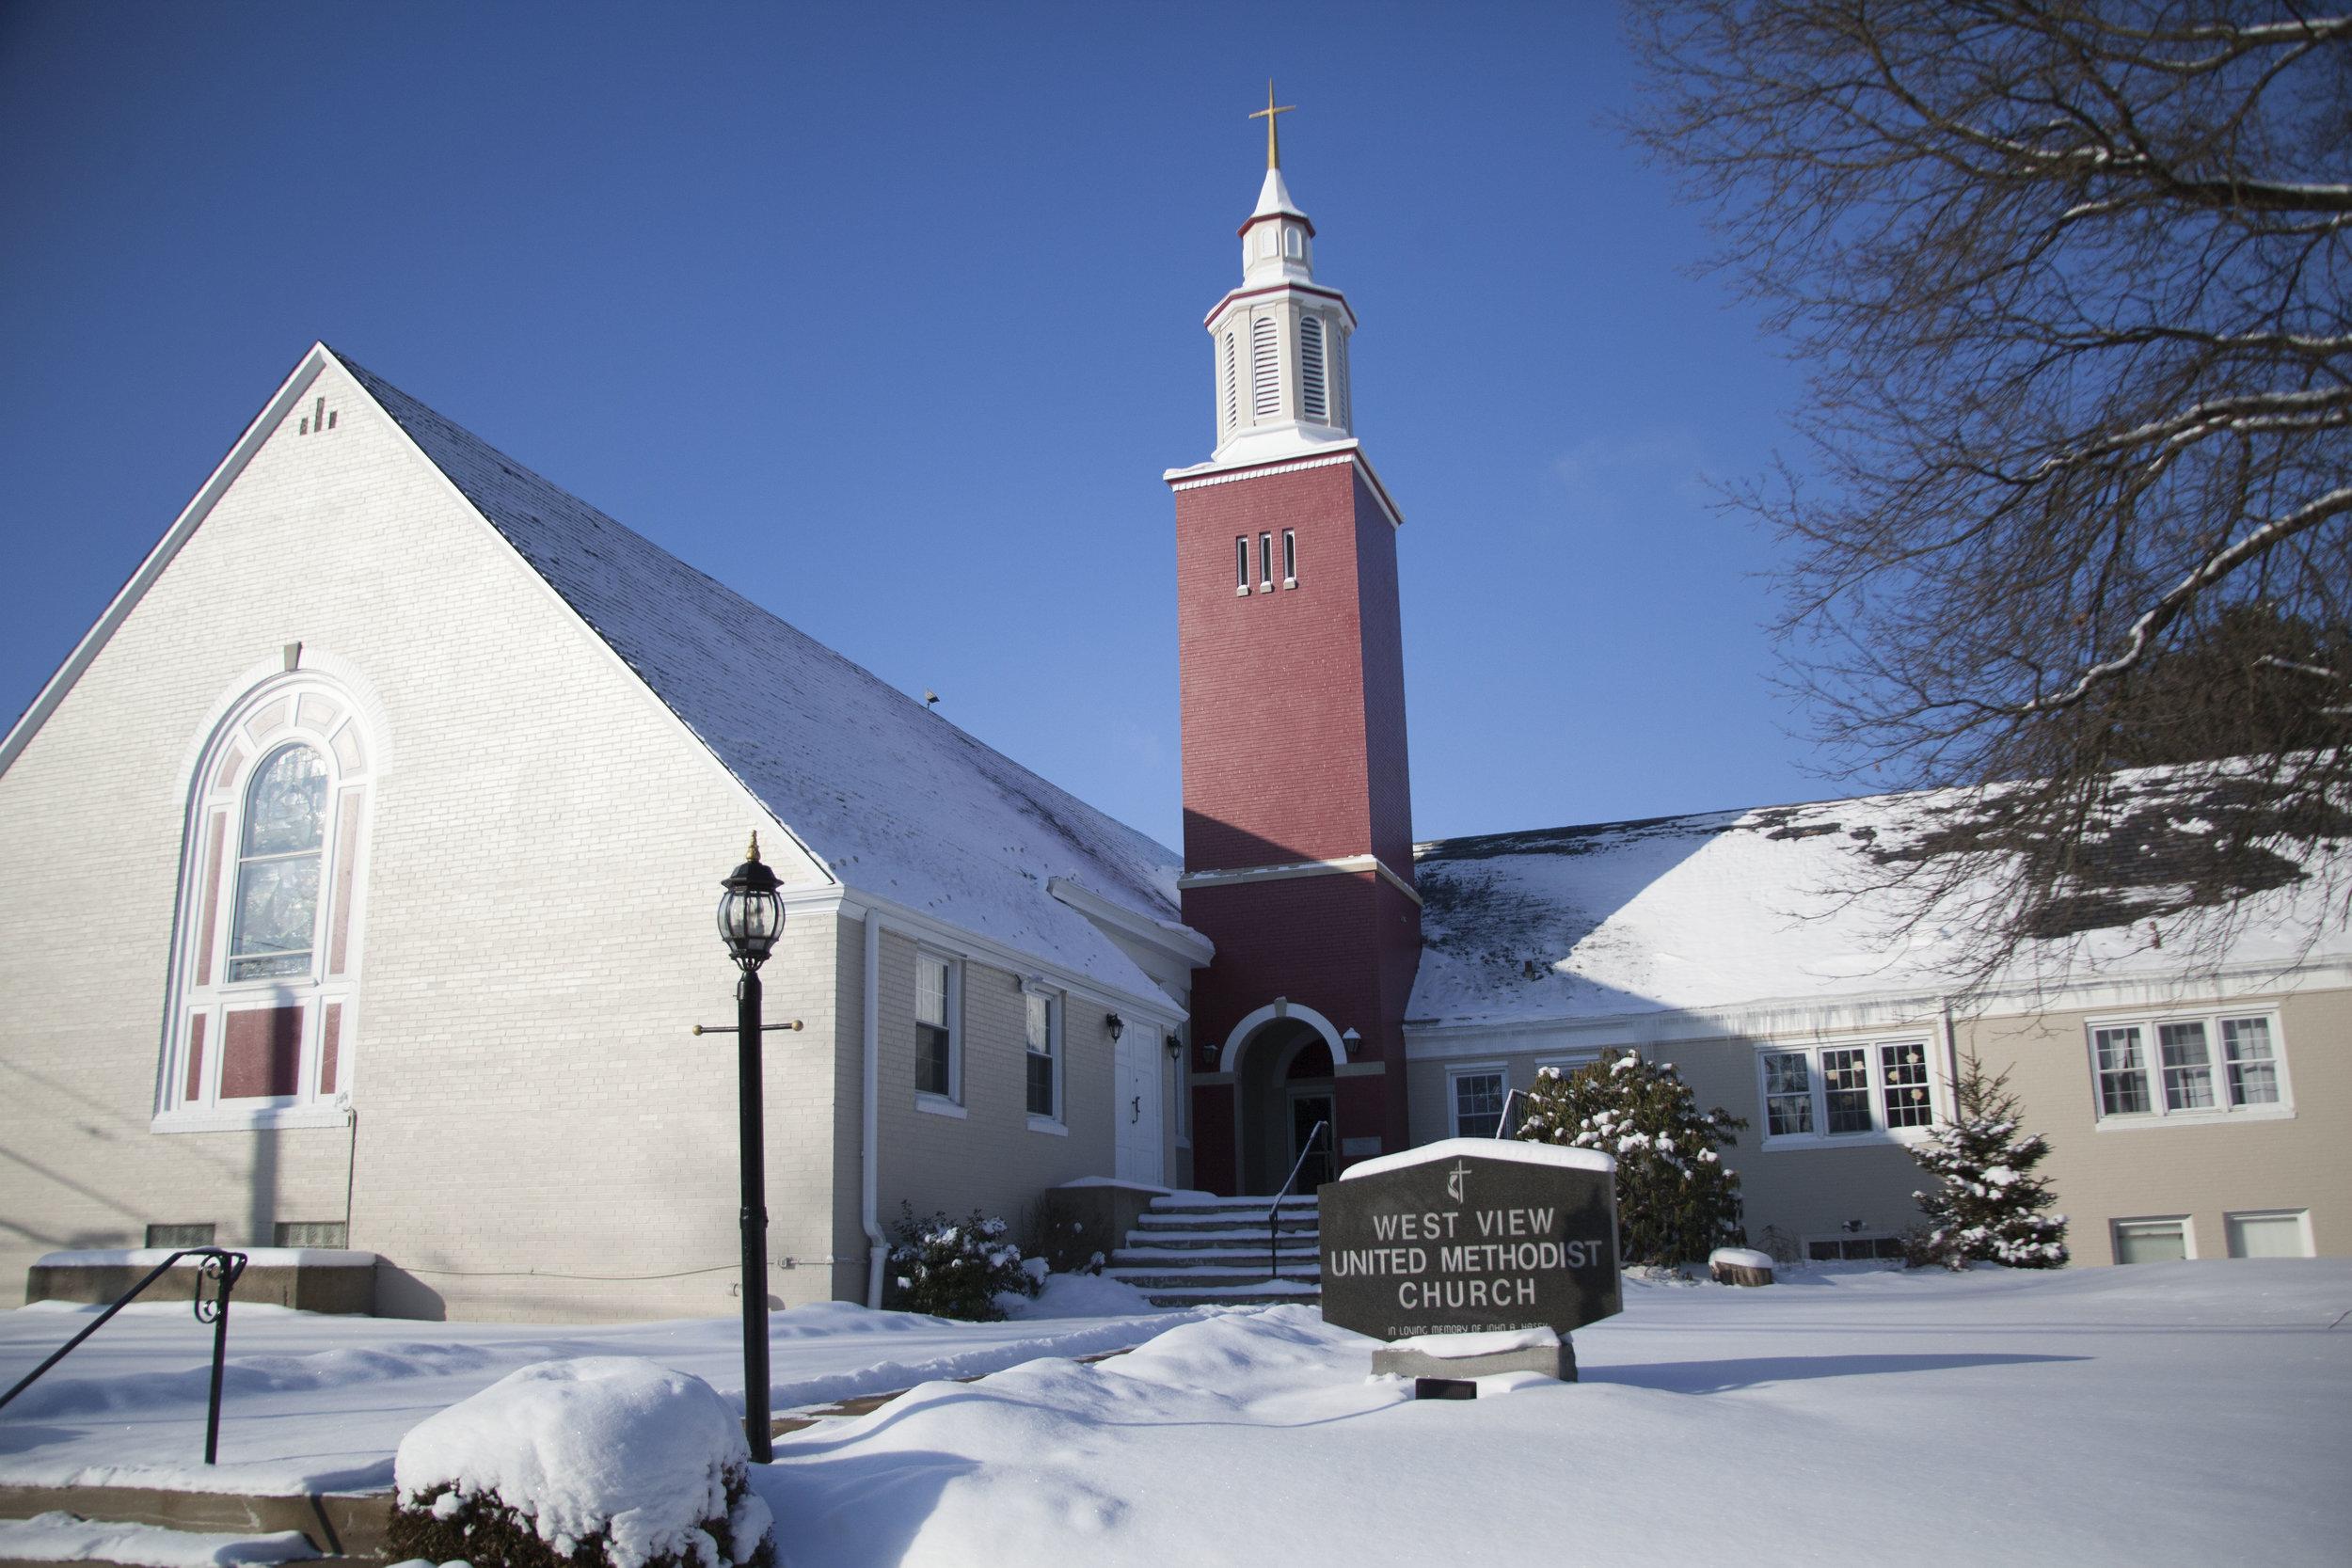 Church_Snow0003.jpg